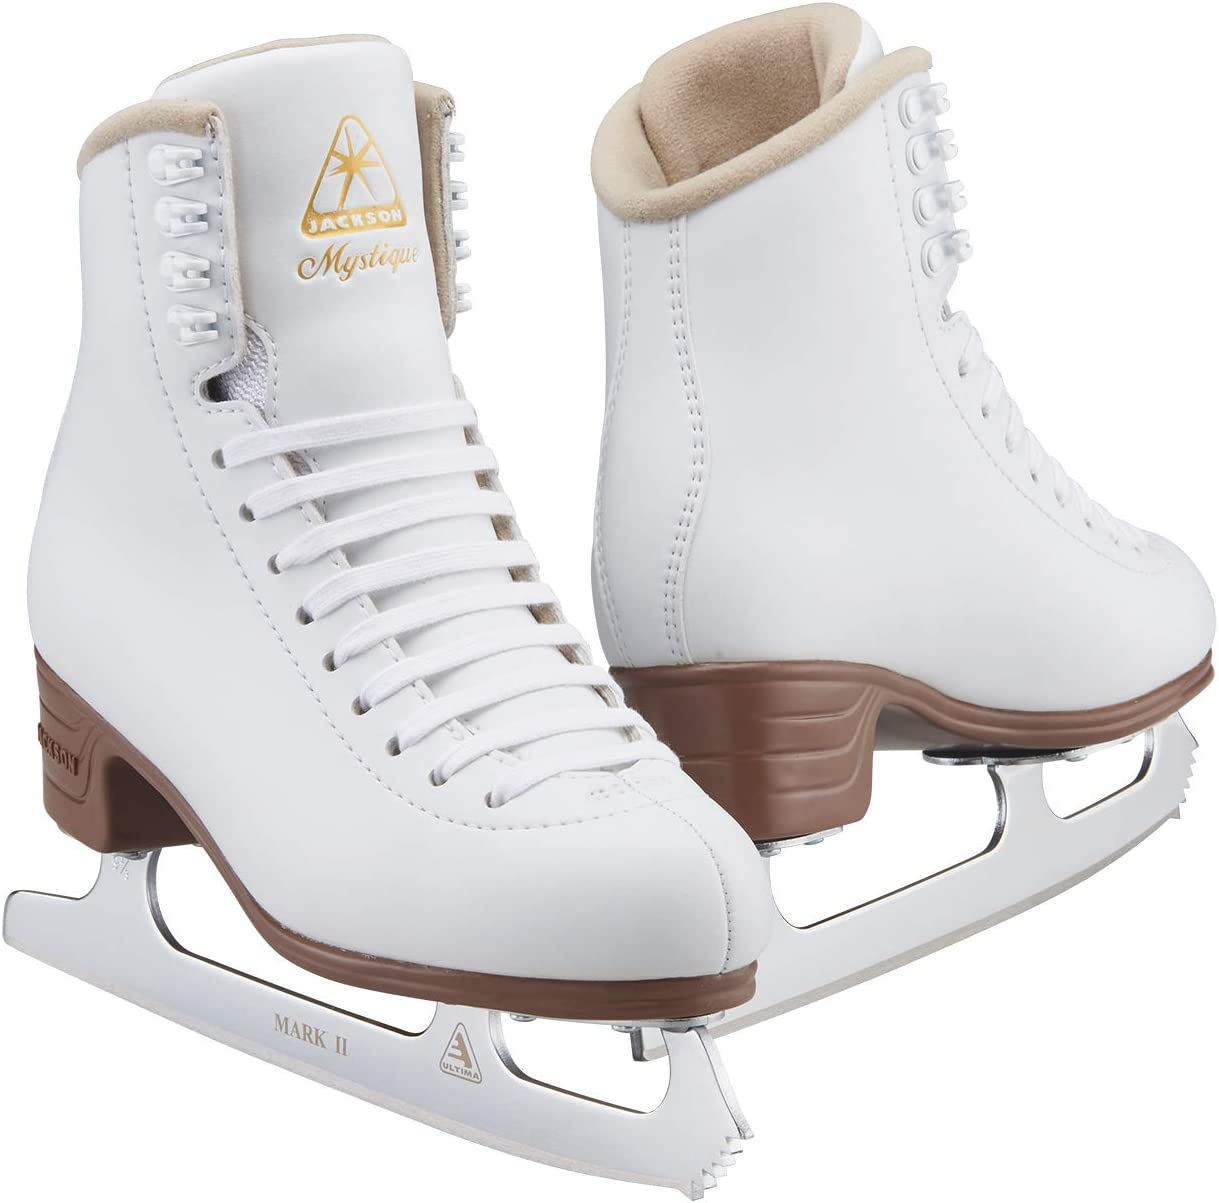 and Boys Girls Jackson Ultima Classique Series Ice Skates for Women Men